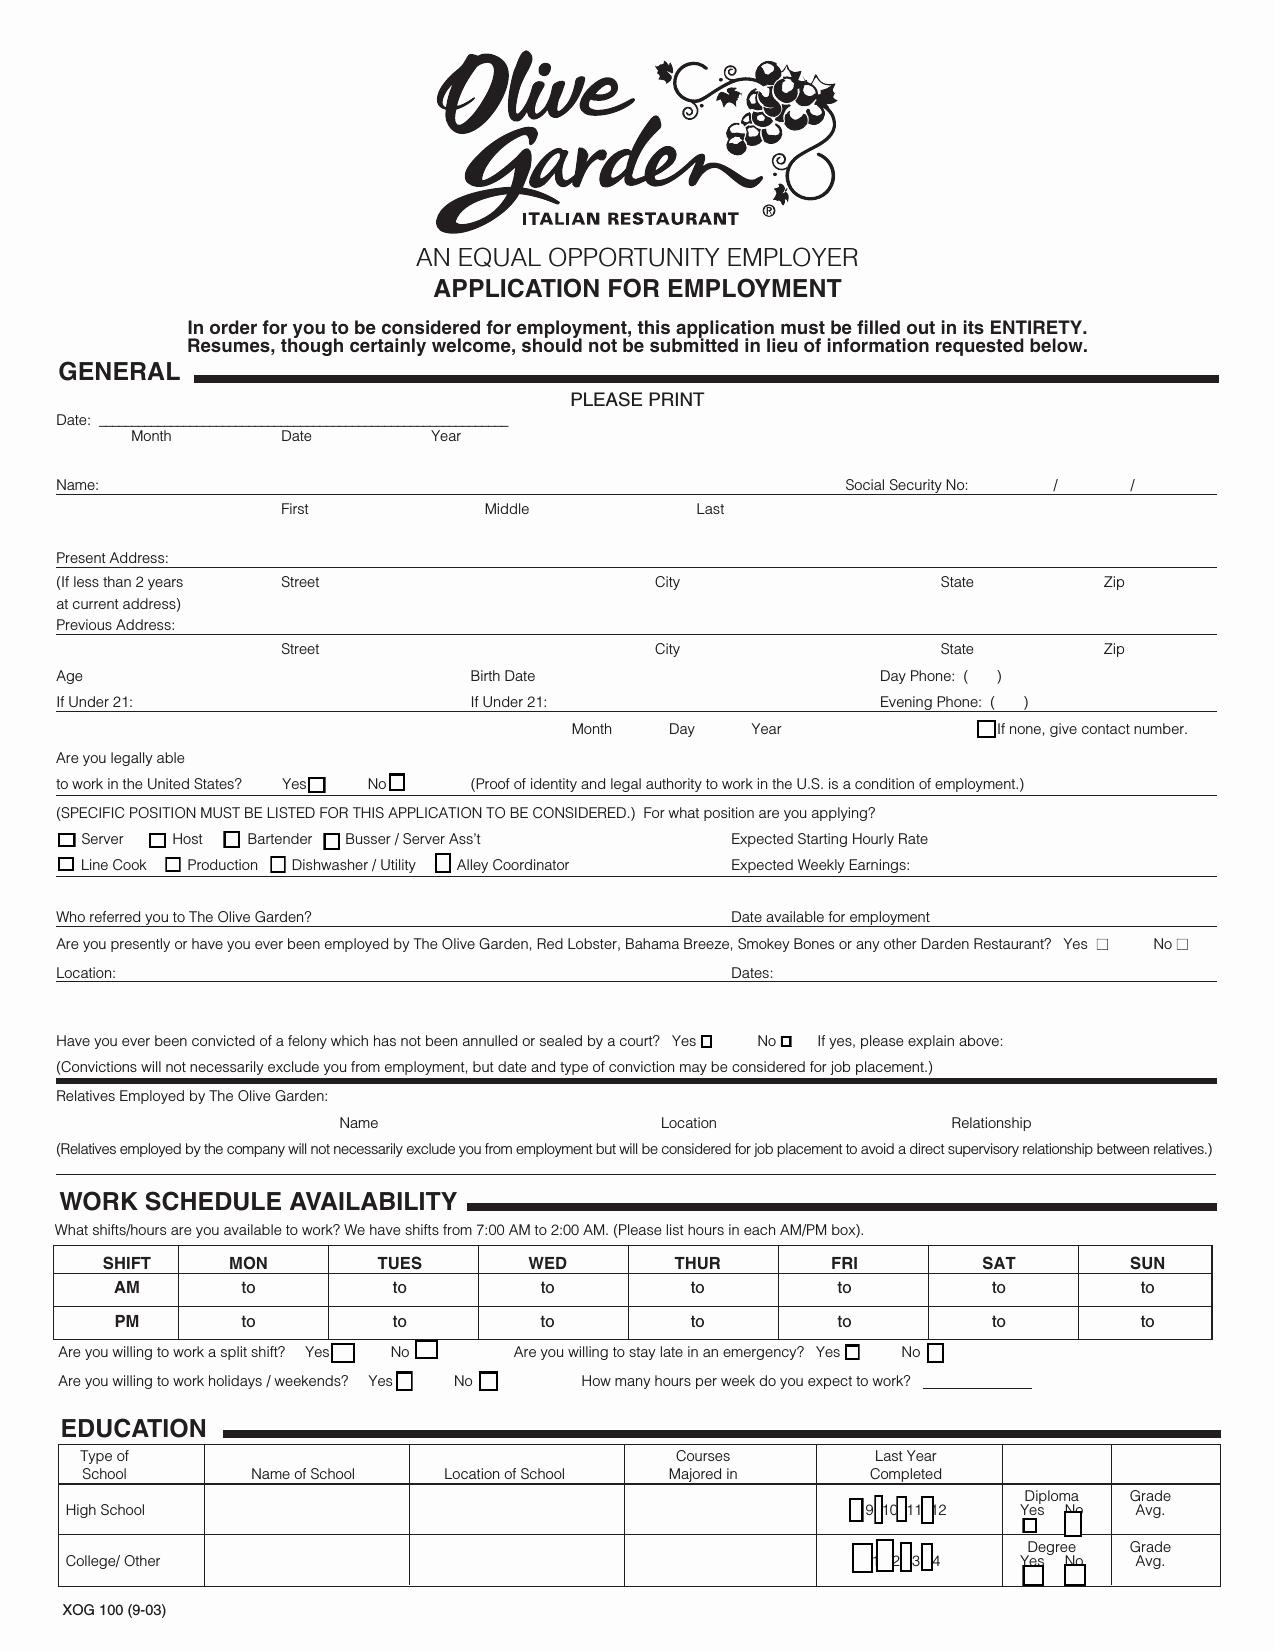 Jobs Application form Pdf Lovely Download Olive Garden Job Application form – Careers